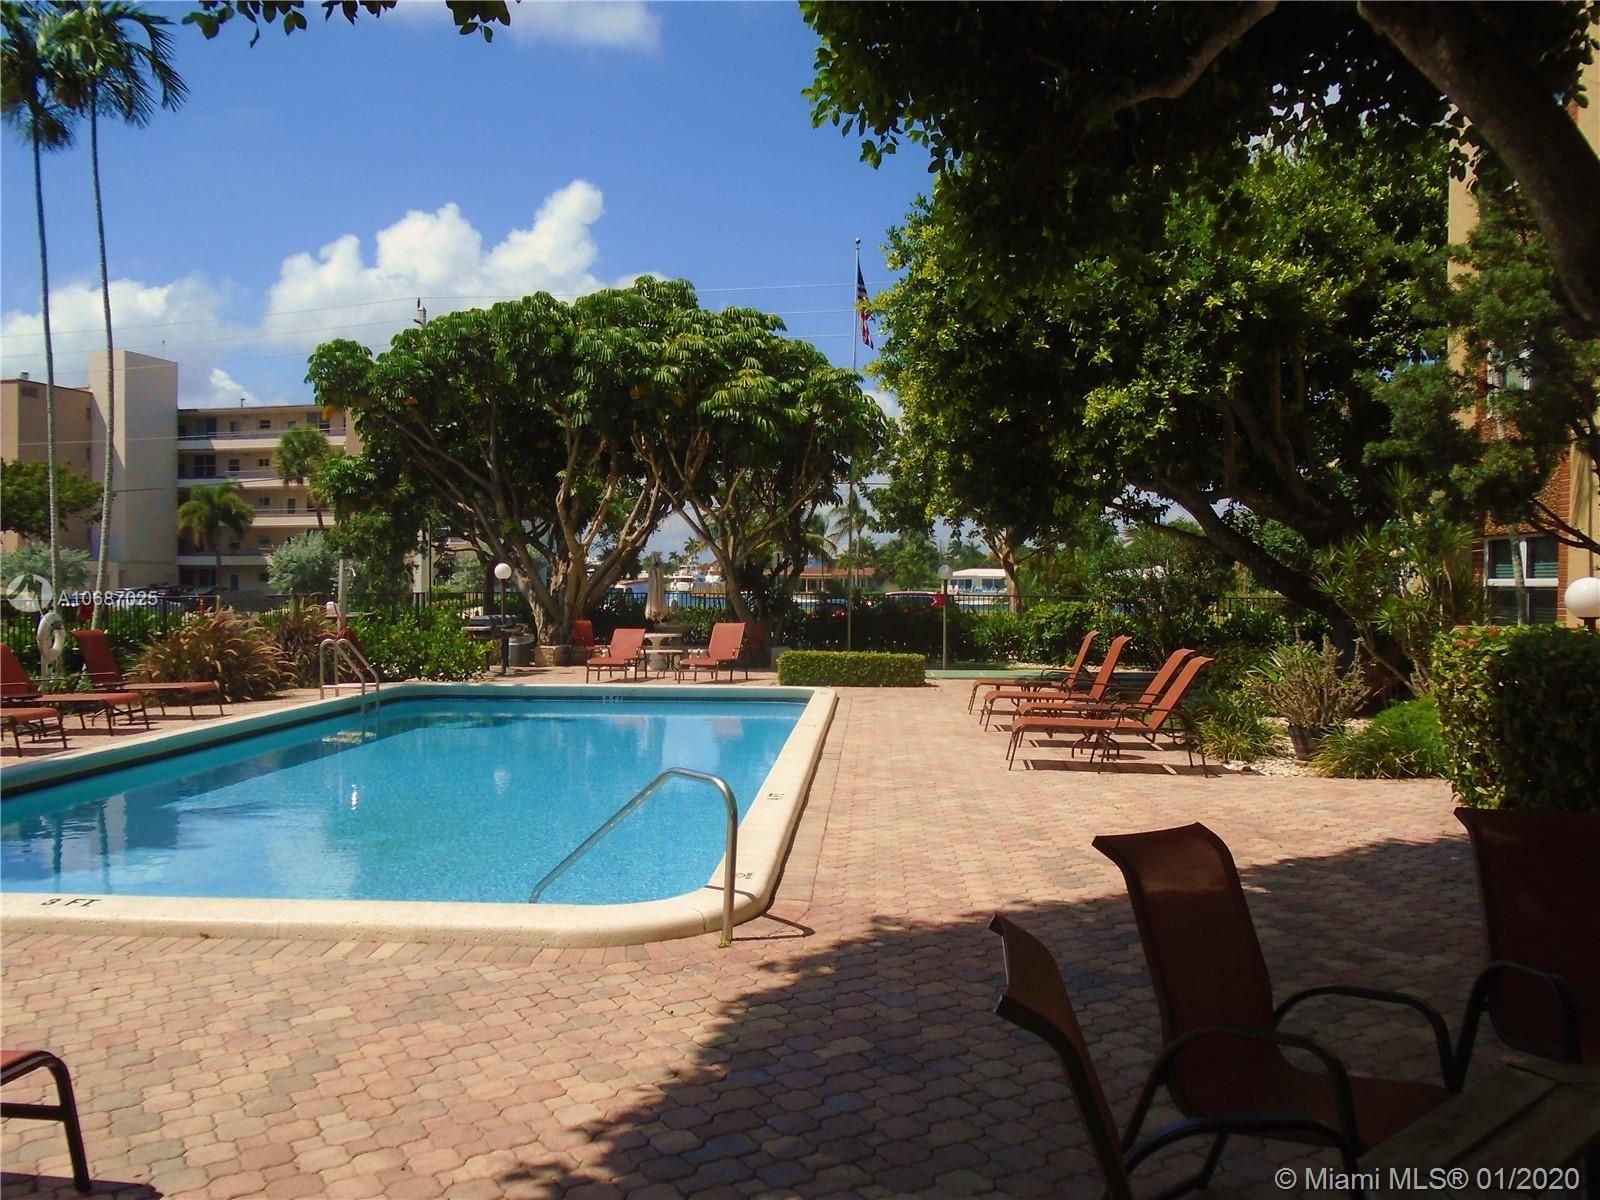 400 N Riverside Dr #202, Pompano Beach, FL 33062 - MLS#: A10687025